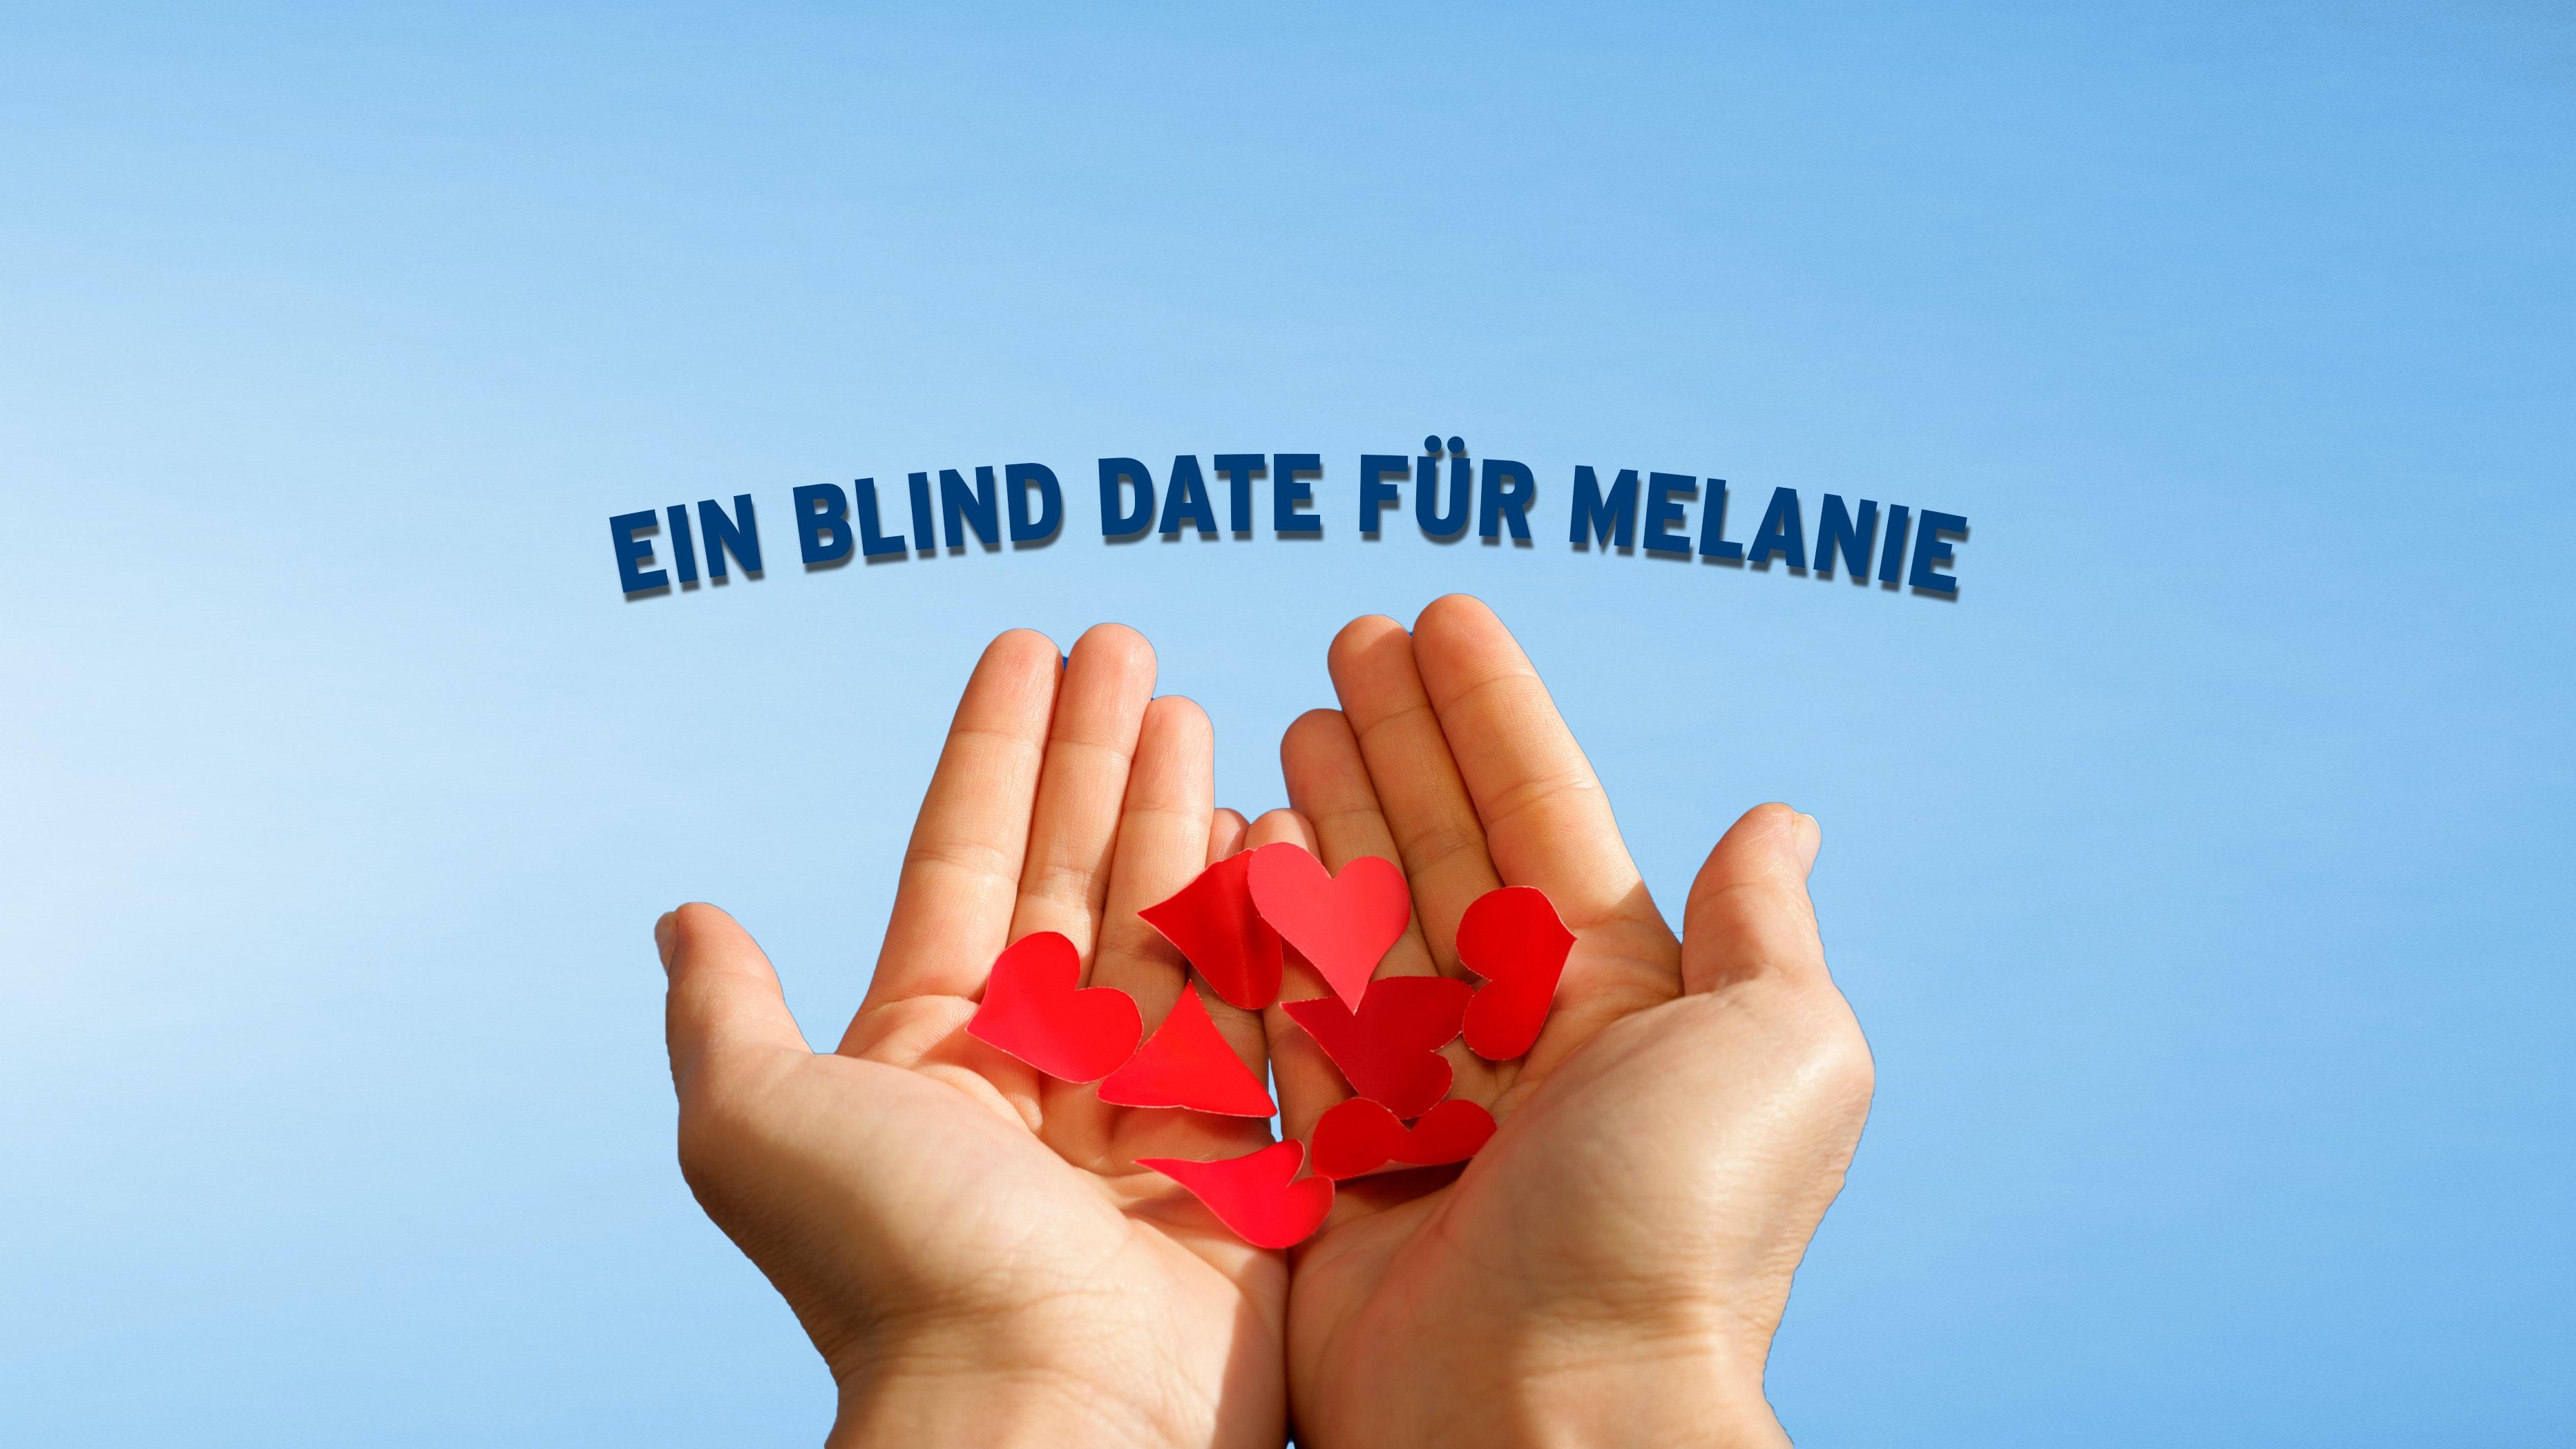 De sh www melanie Investitionsbank Schleswig